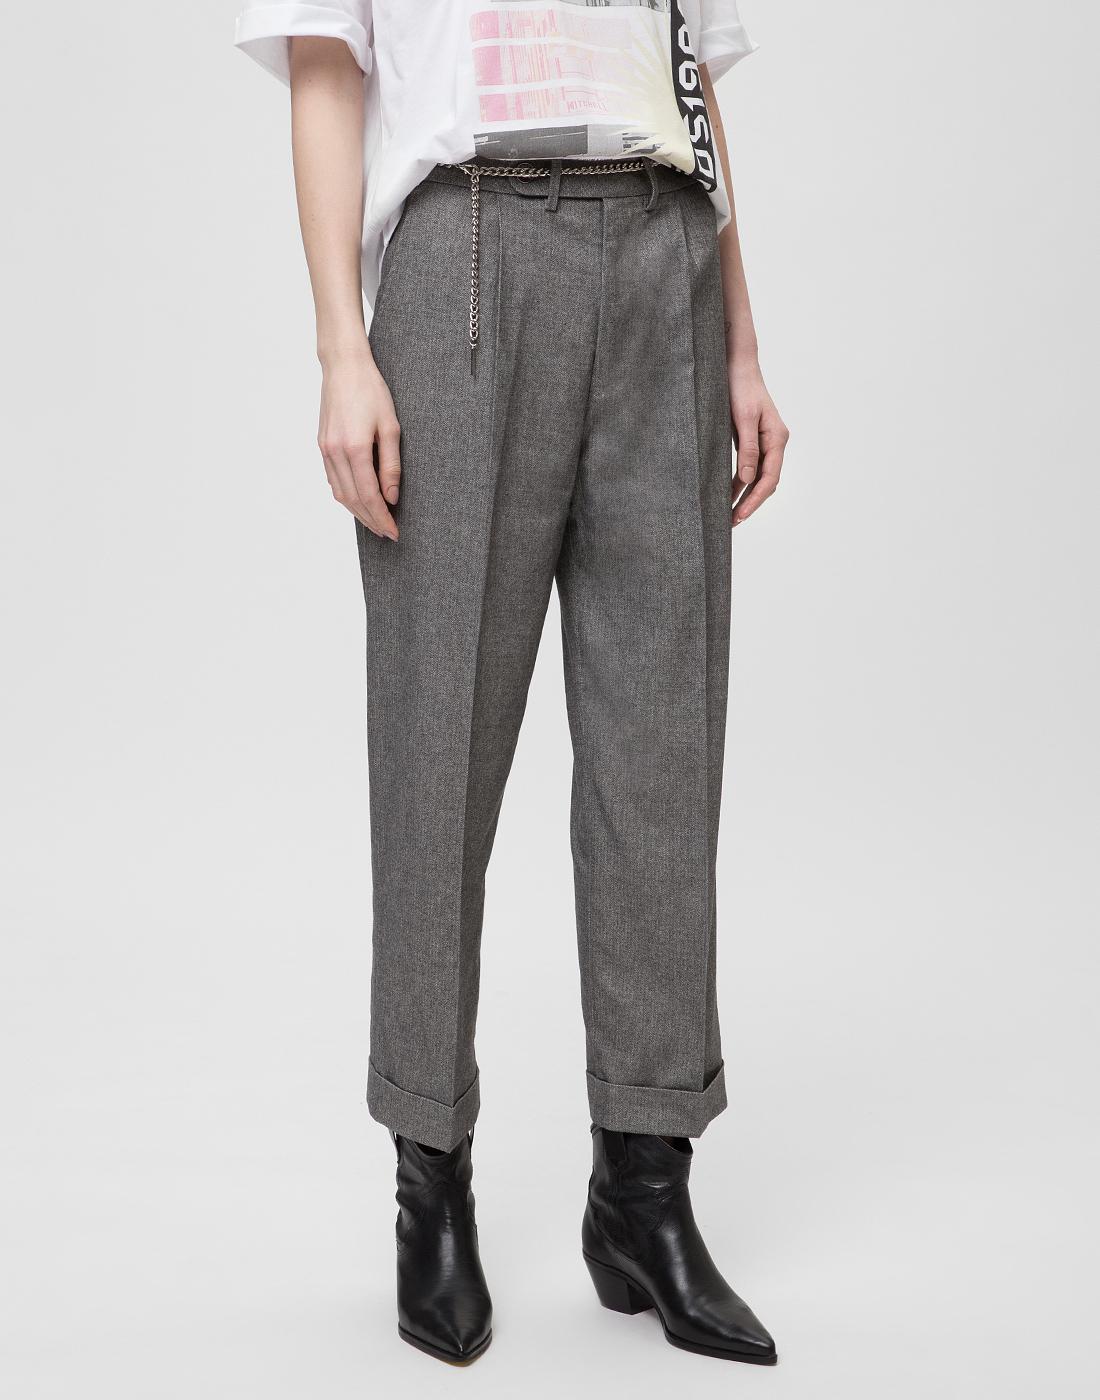 Женские серые брюки Tramarossa SO168-3